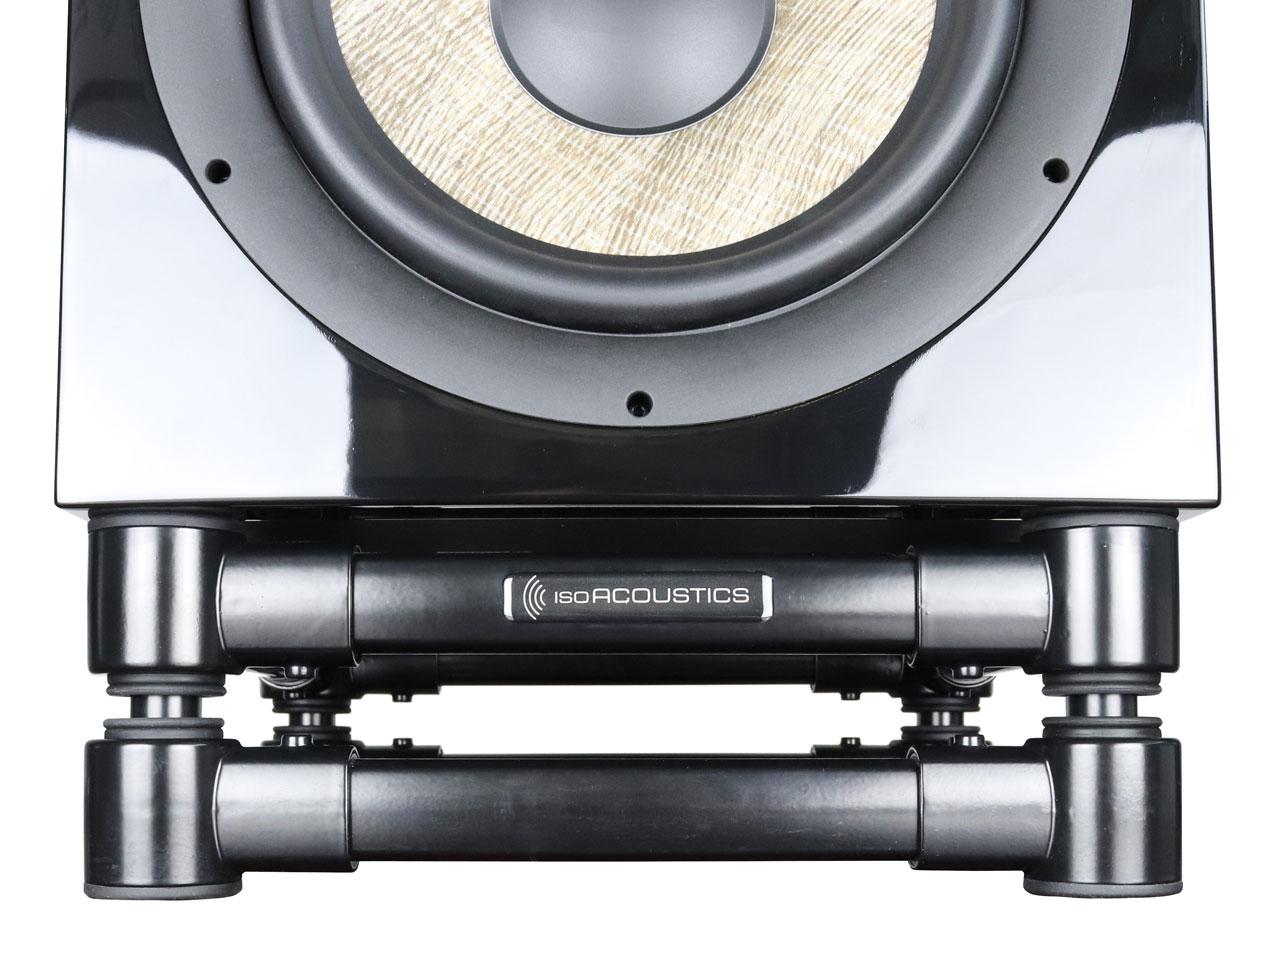 IsoAcoustics Modular Aluminum - Nominted for TEC Awards